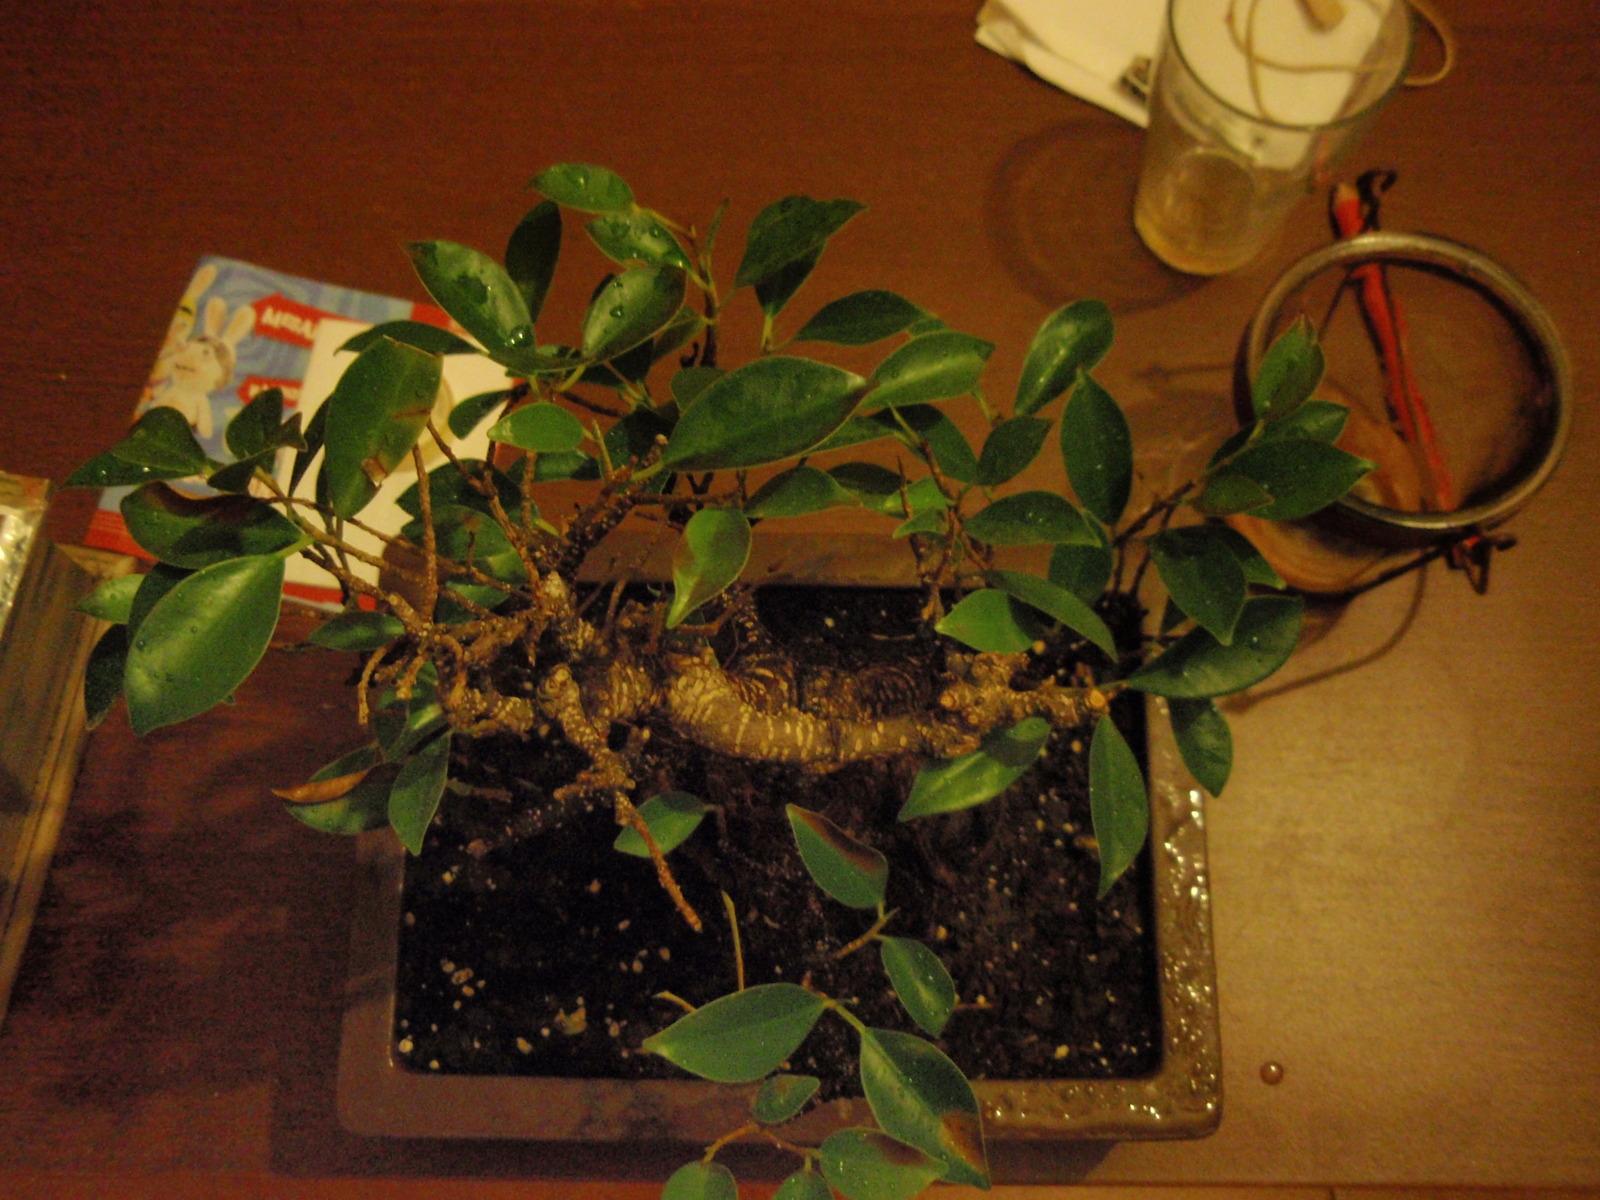 Hojas marrones en Ficus Zmfmsm